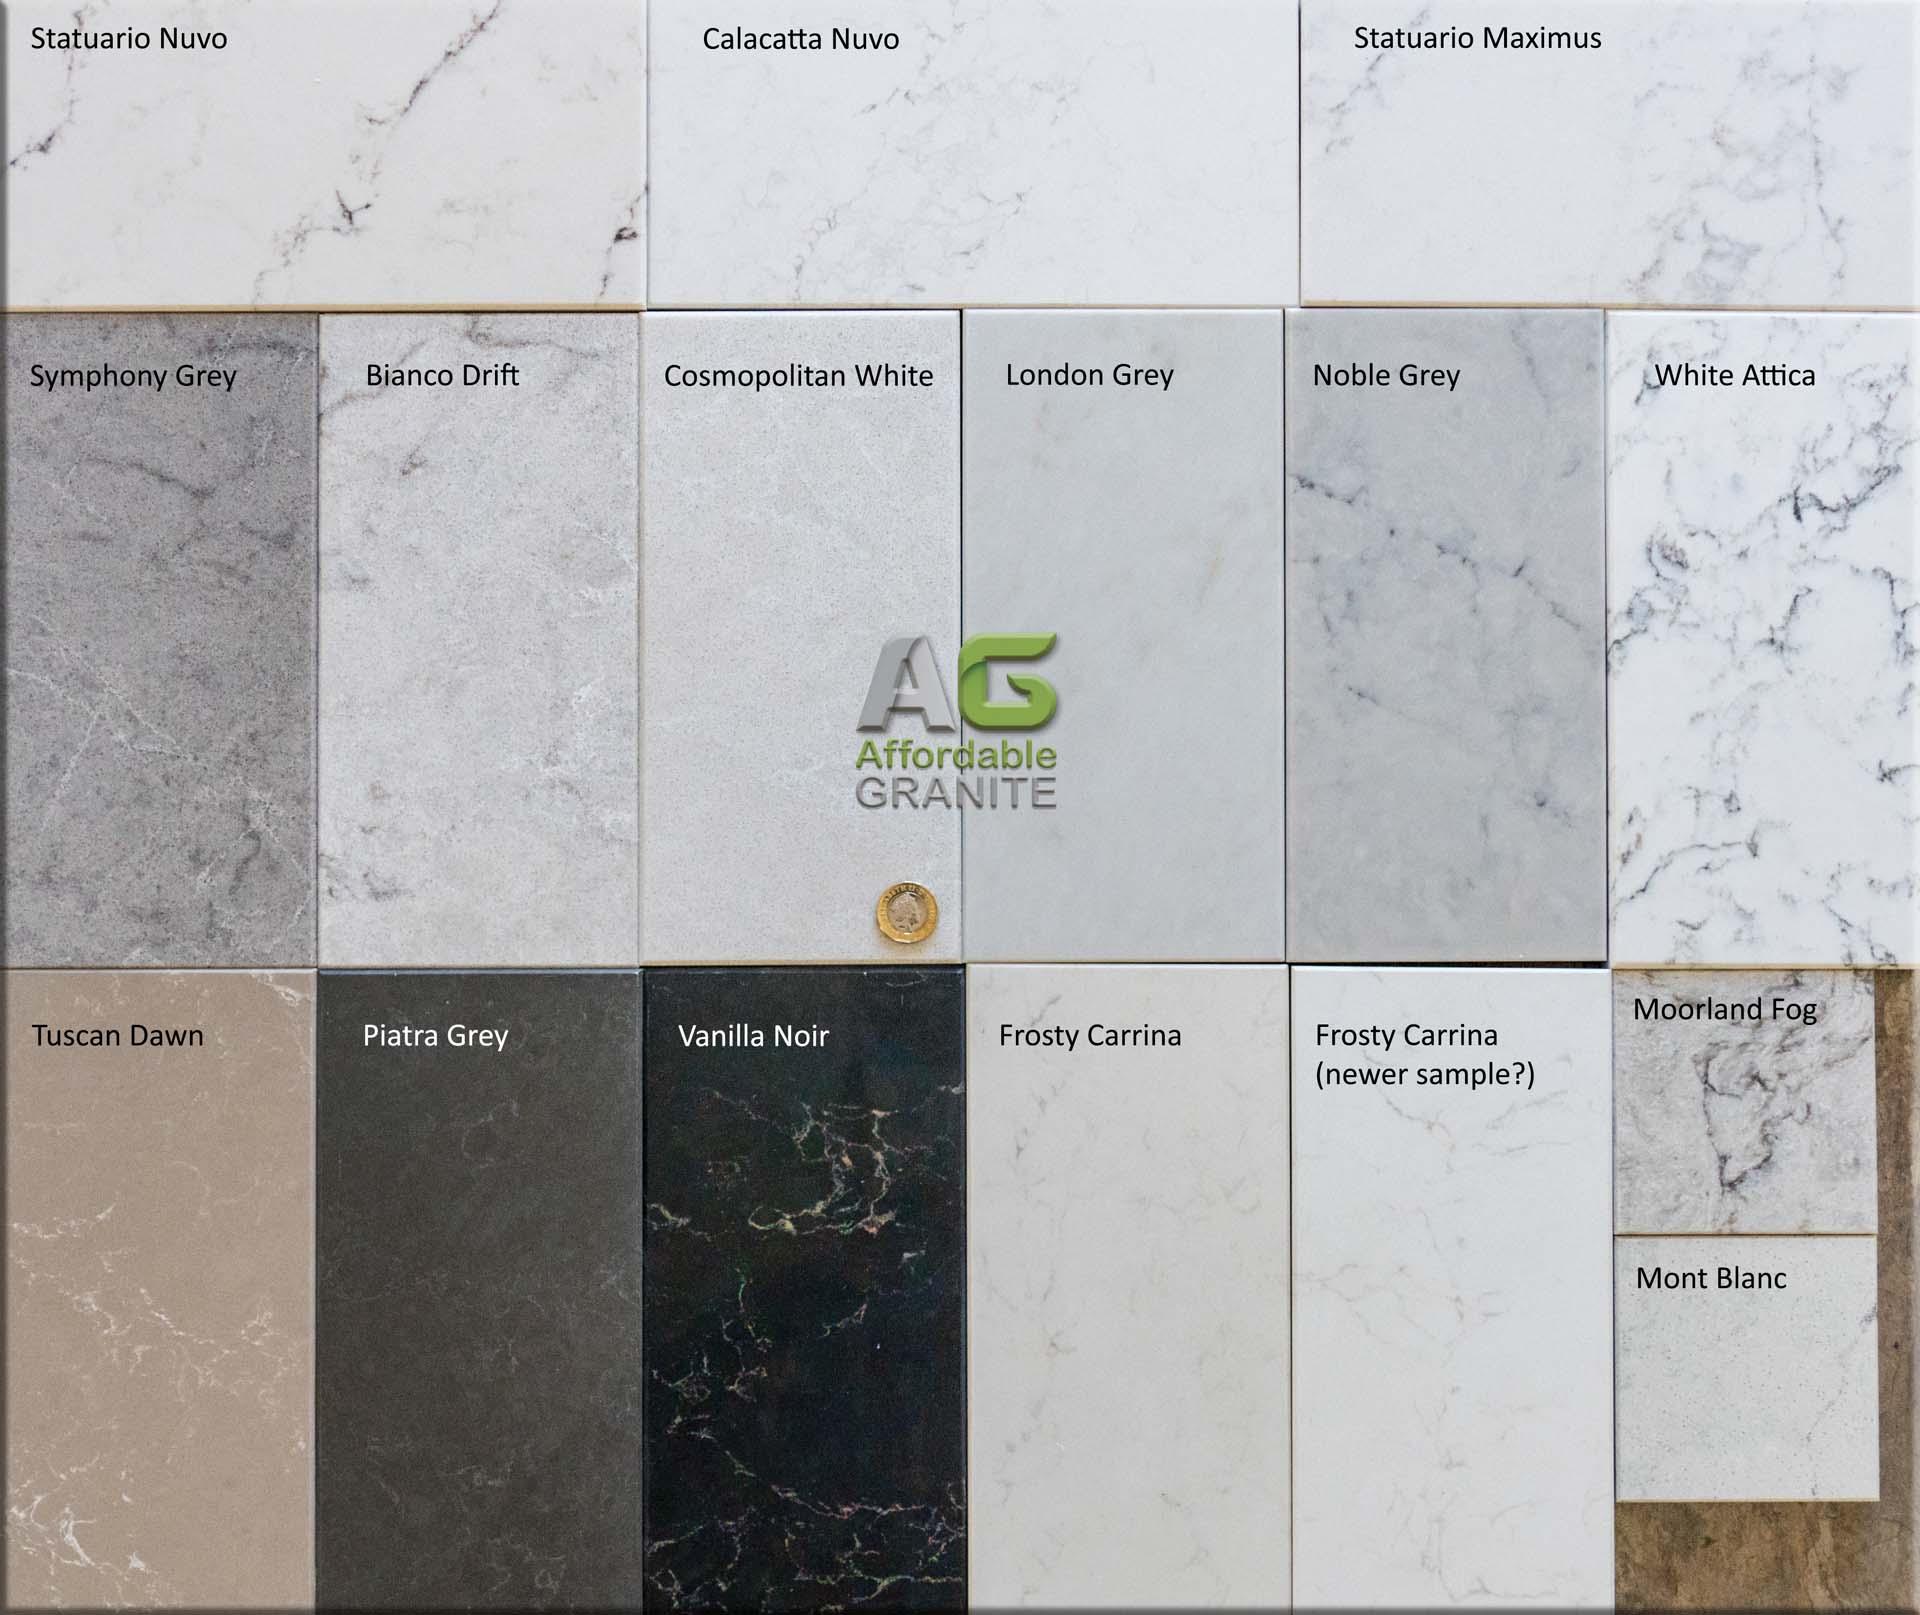 Caesarstone Marbled Quartz Groups 4 and 5a